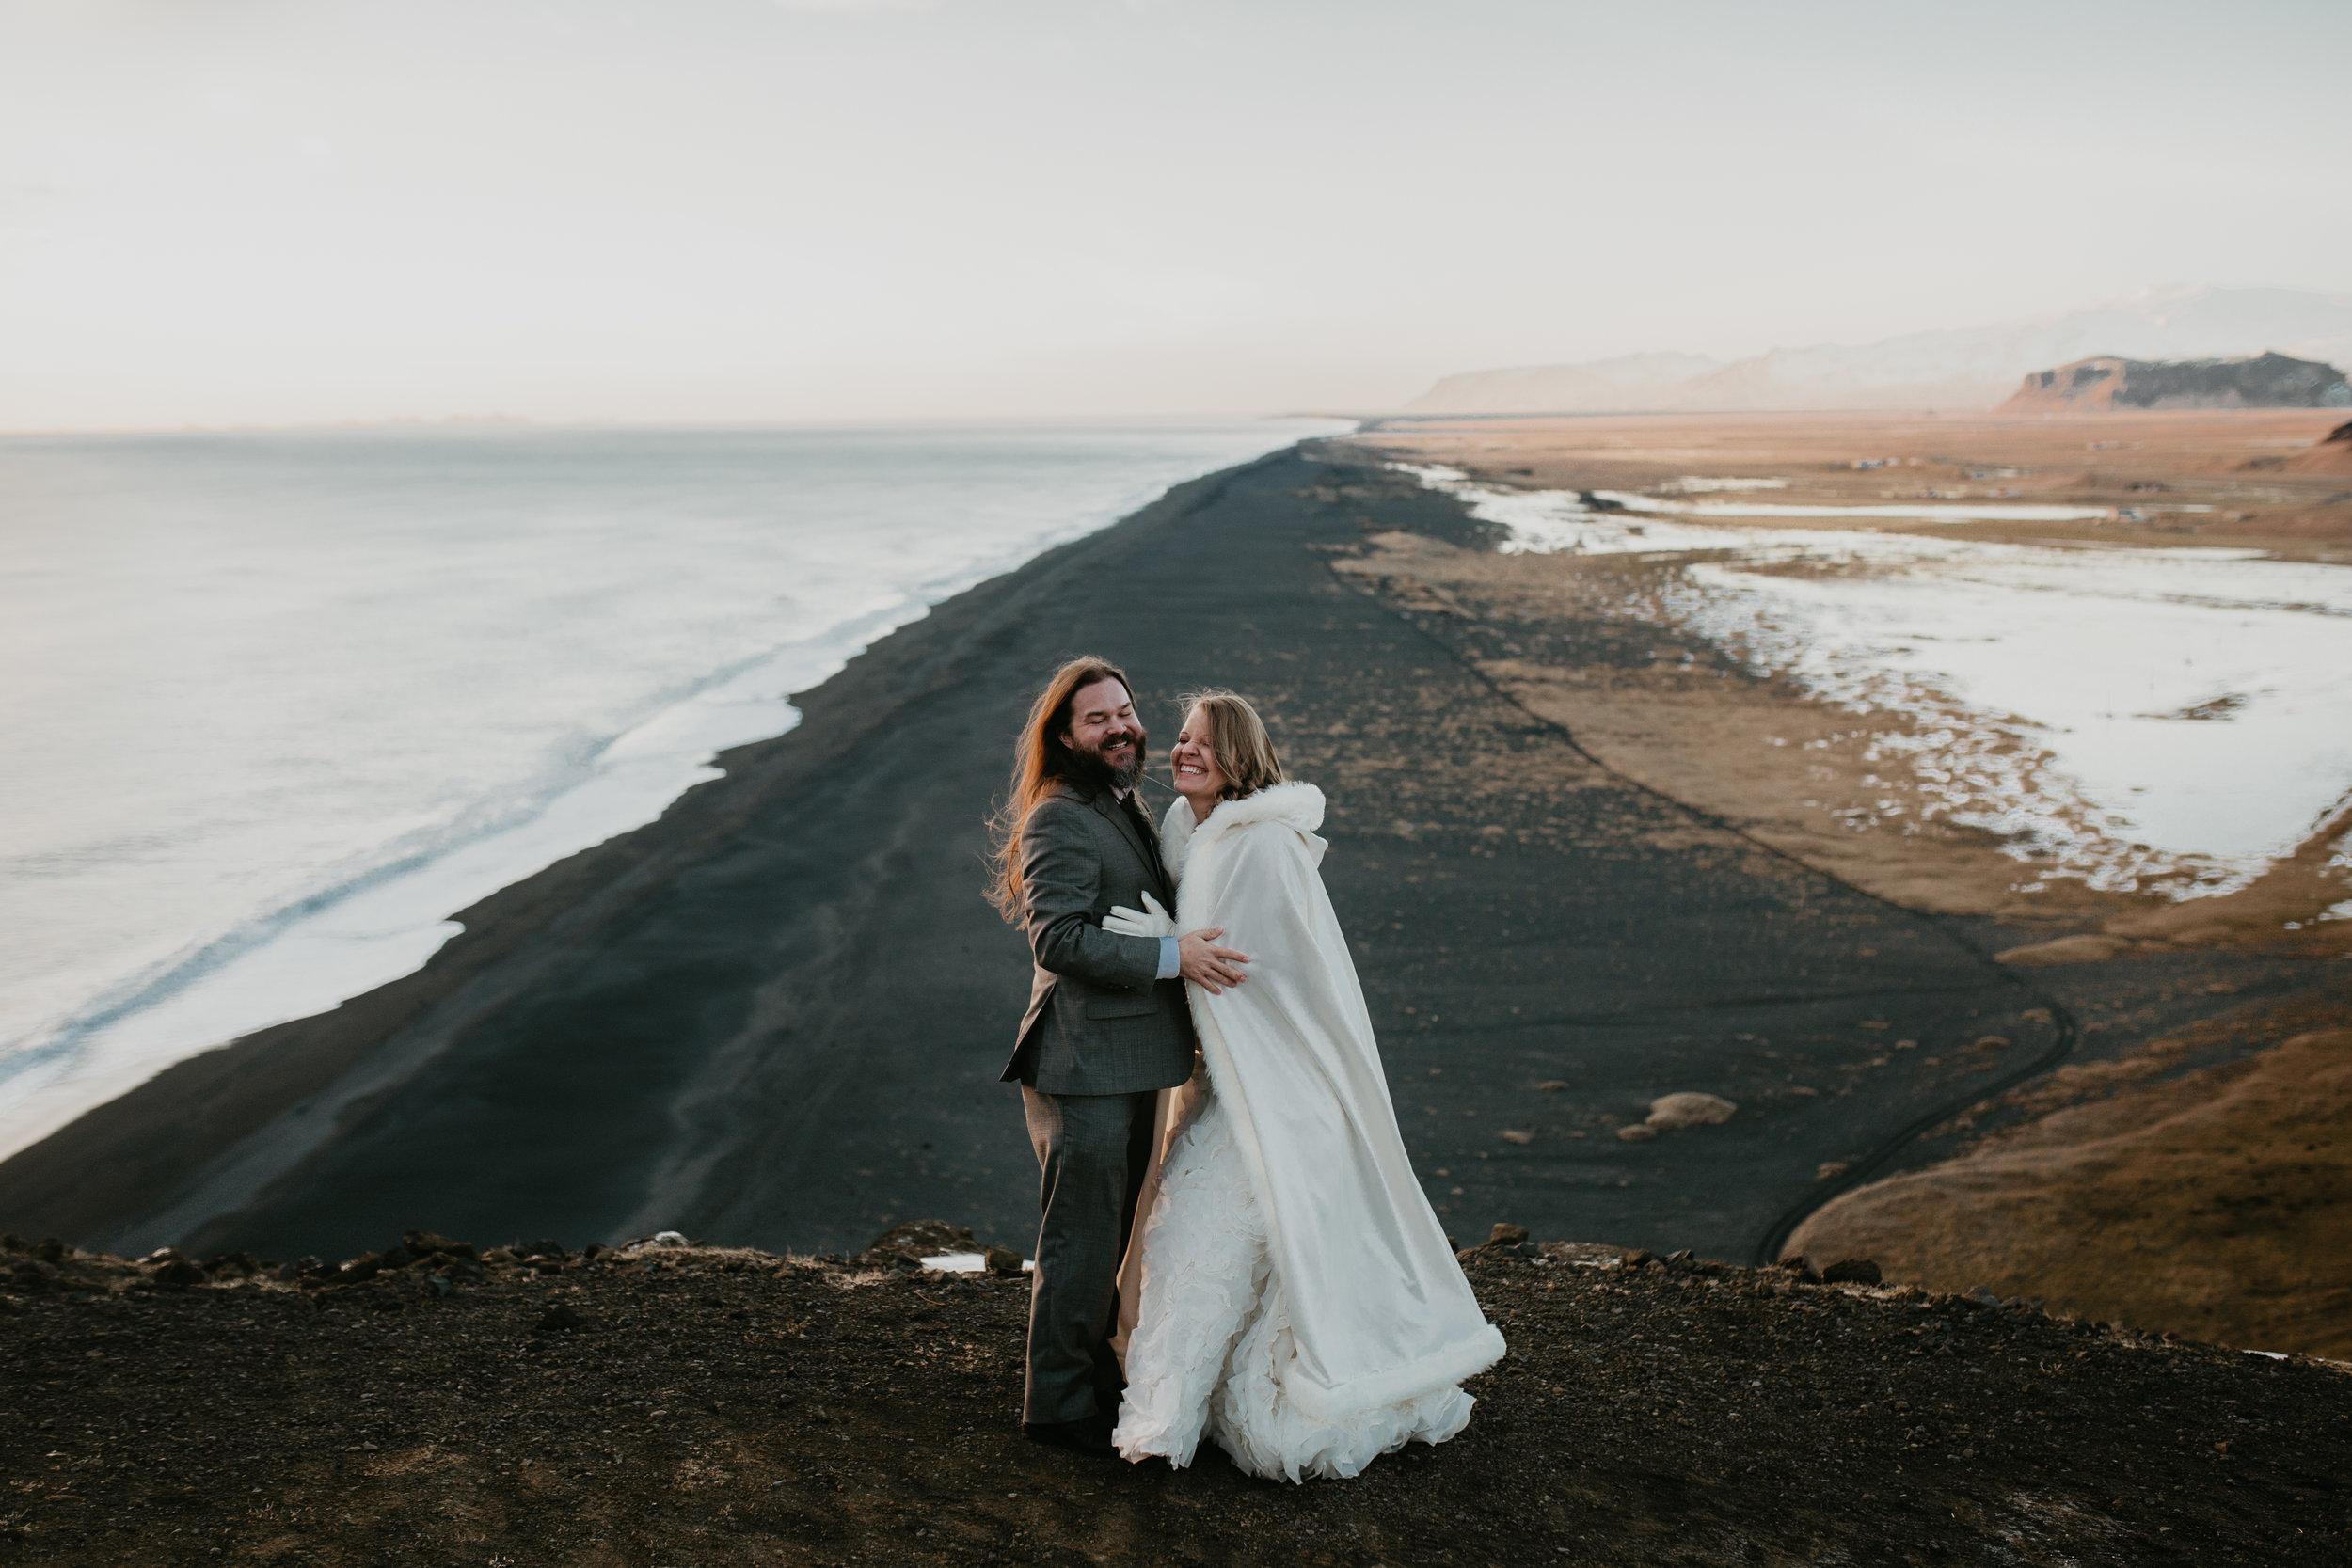 nicole-daacke-photography-iceland-winter-sunset-adventure-elopement-skogafoss-waterfall-black-sand-beach-dyrholaey-vik-iceland-intimate-wedding-black-church-elopement-photographer-38.jpg